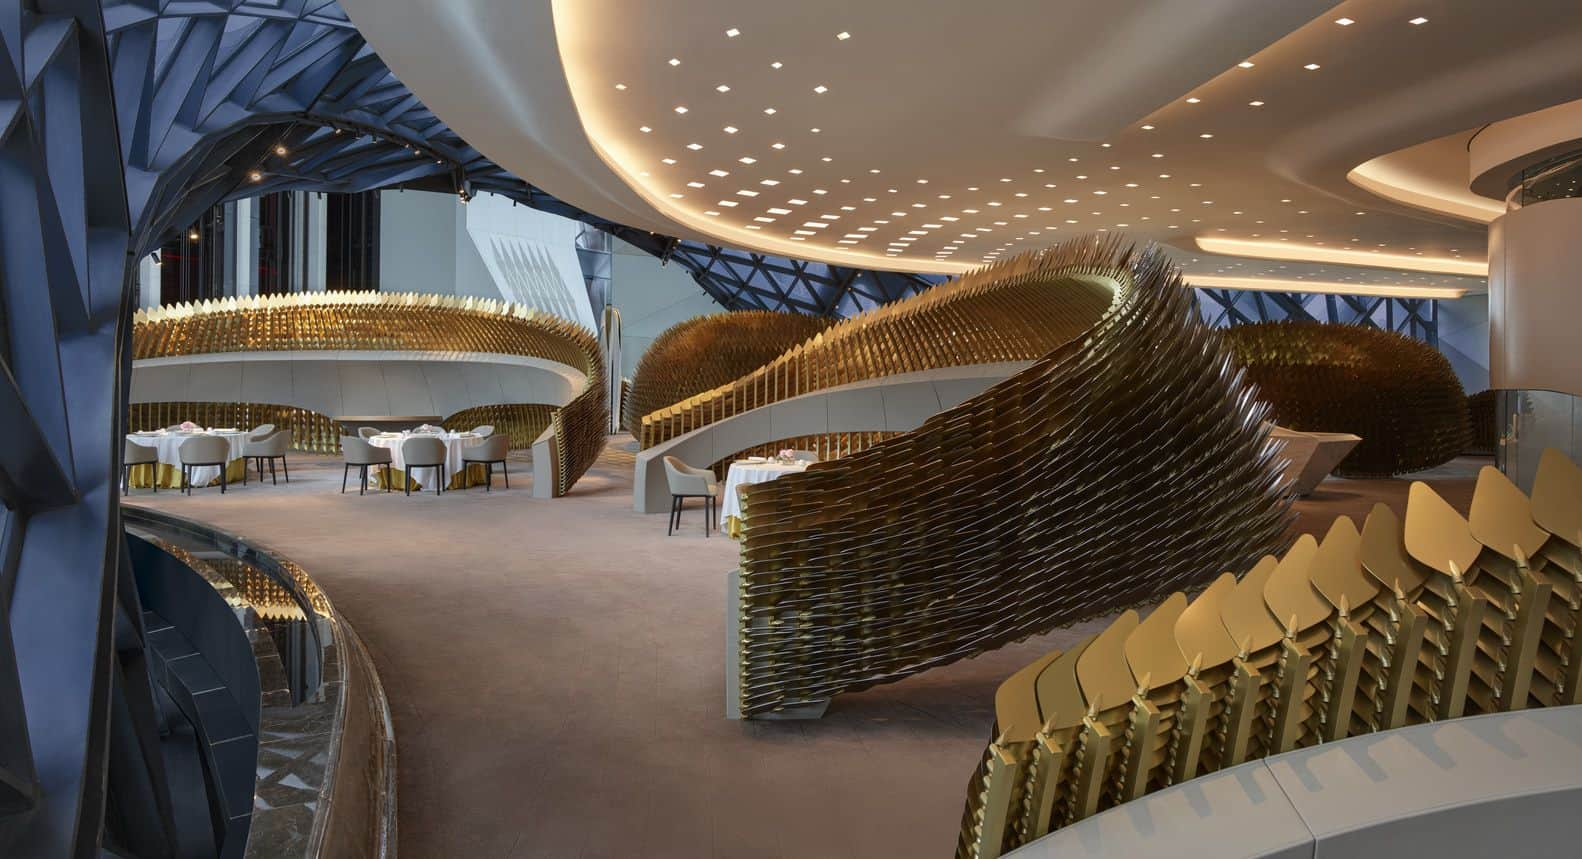 morpheus hotel zaha hadid architects 11